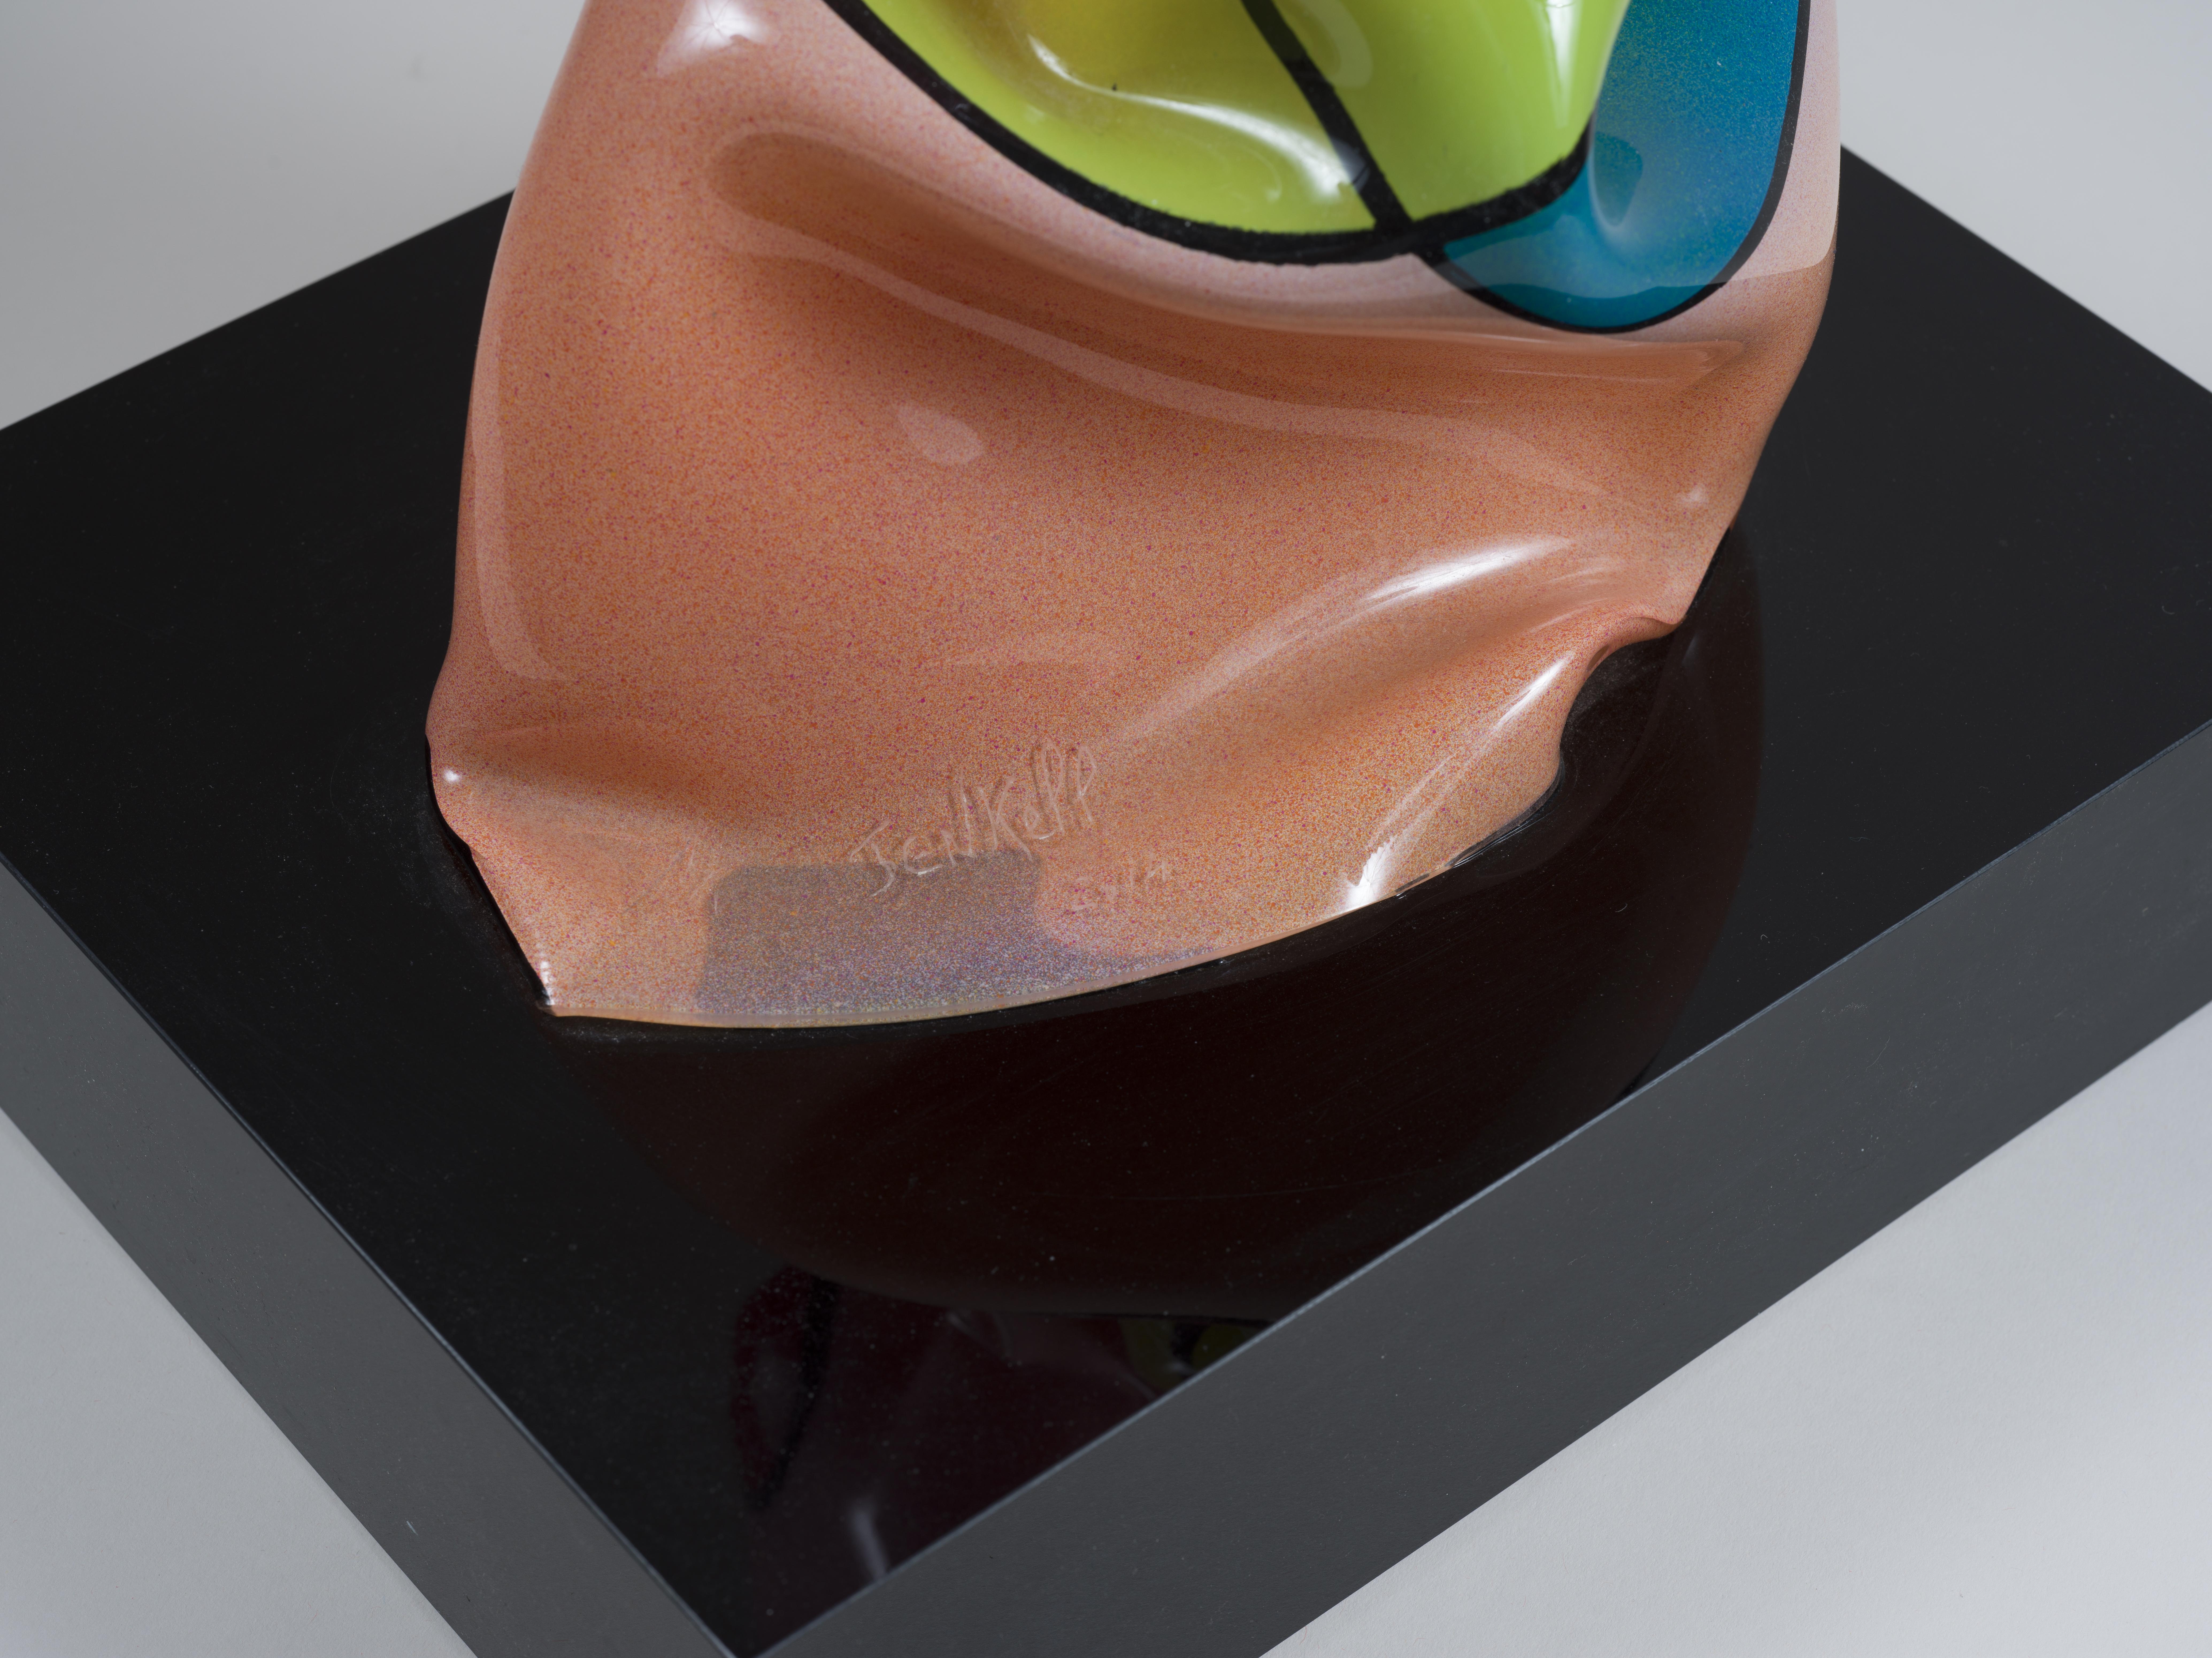 Lot 29 - Laurence JENKELL (1965) - Wrapping Bonbon Bagatelle, N°2314? 2014 - Plexiglas peint [...]